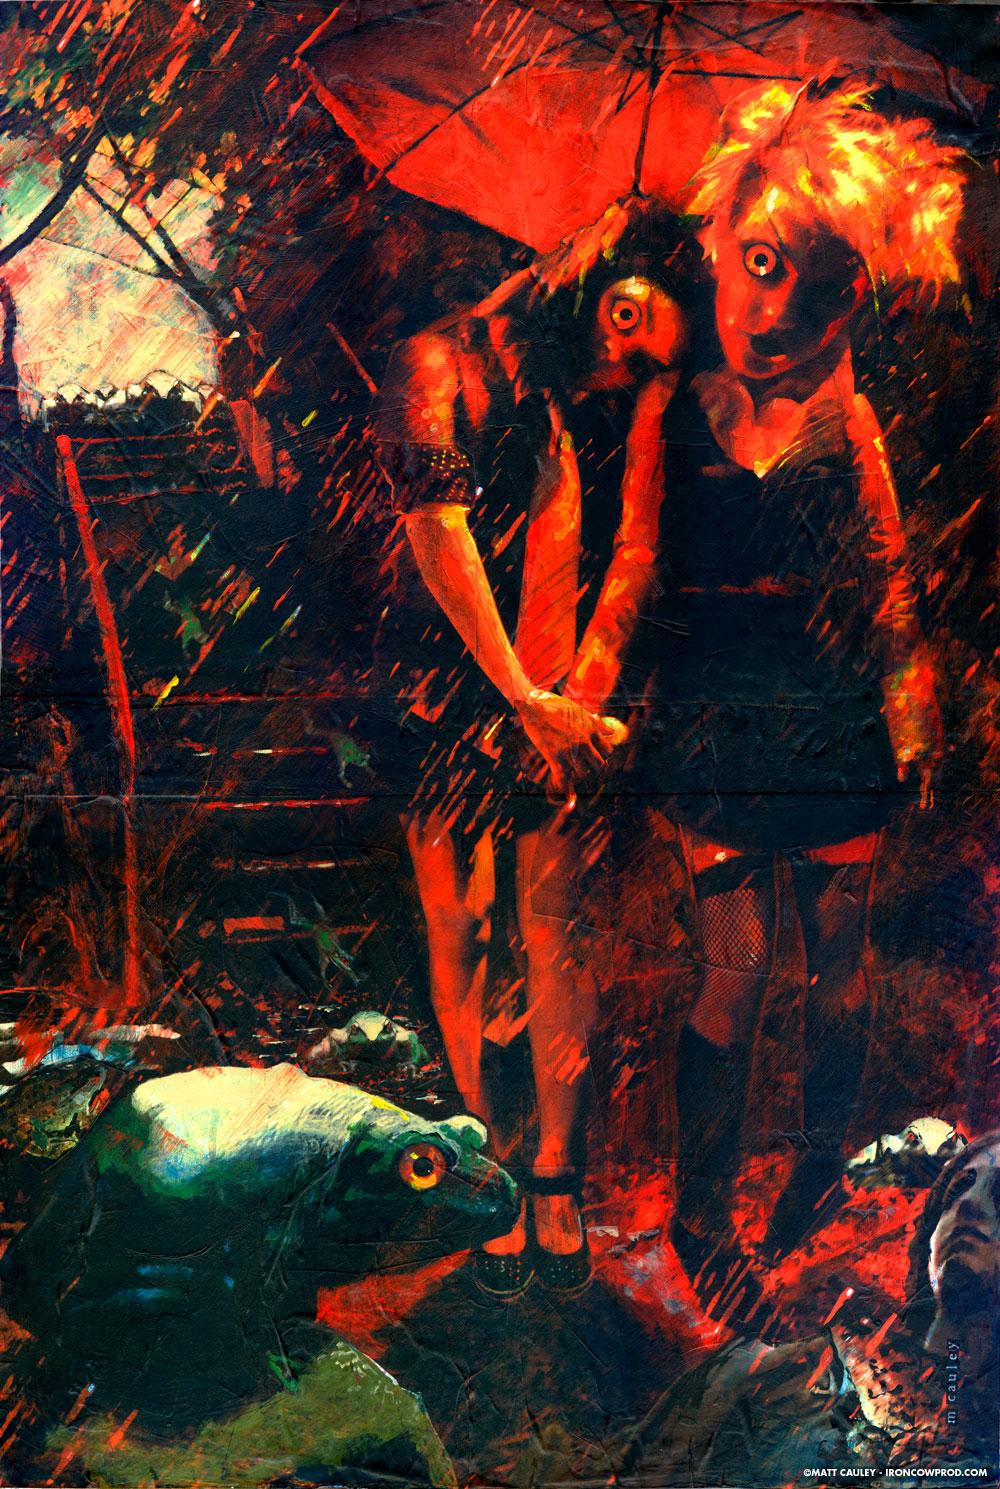 """Saturday"" Mixed Media Acrylics on Masonite. 20 x 30 inches. Painted 2006 by Matt 'Iron-Cow' Cauley."